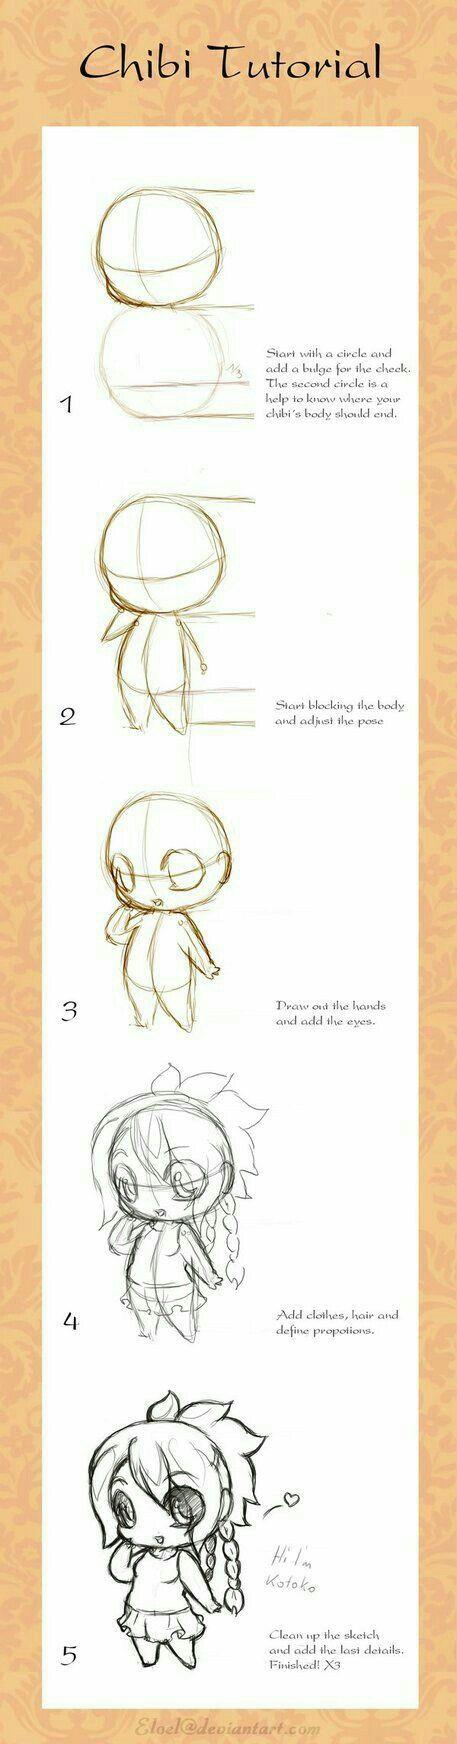 Chibi Tutorial, text; How to Draw Manga/Anime